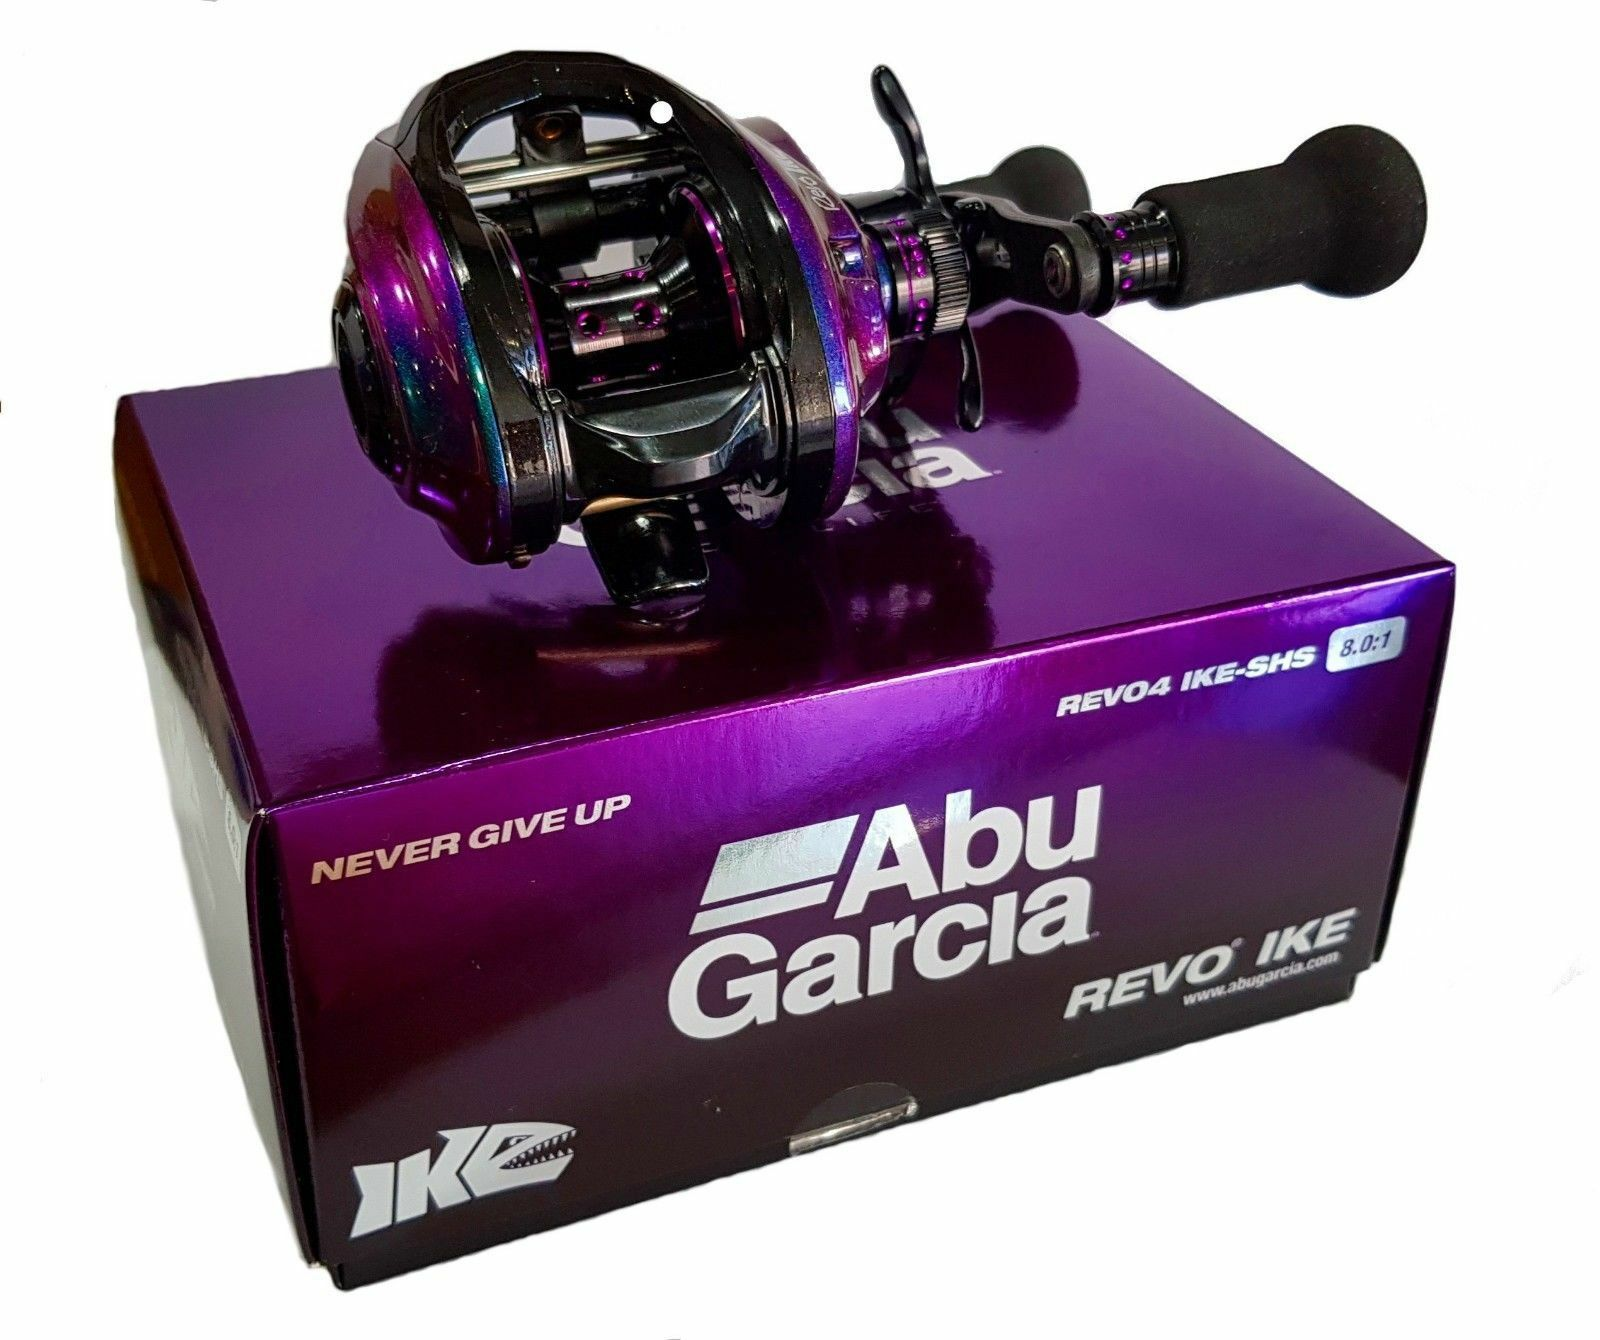 Abu Garcia Revo Revo4 IKE-SHS Right Baitcasting  Fishing Reel Free USA Shipping  order now enjoy big discount